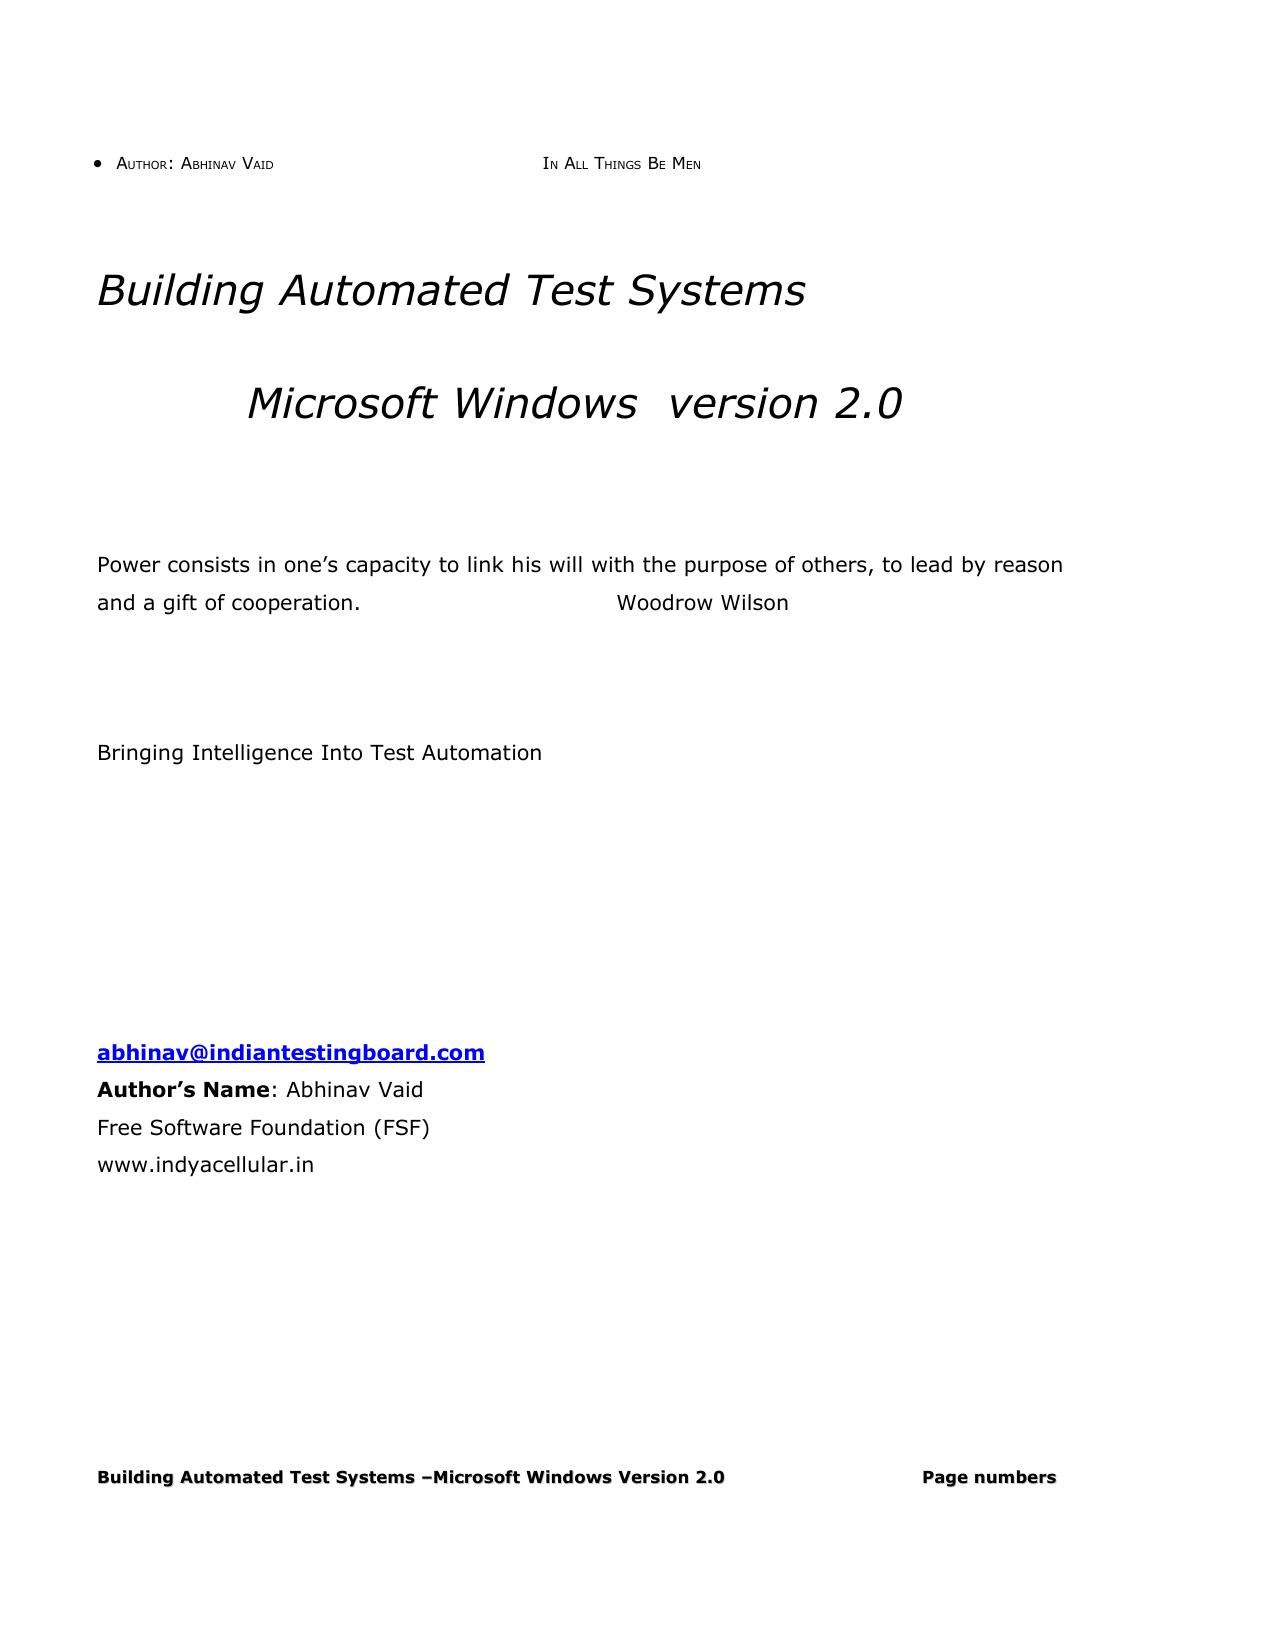 Building Automated Test Systems Microsoft Windows | manualzz com